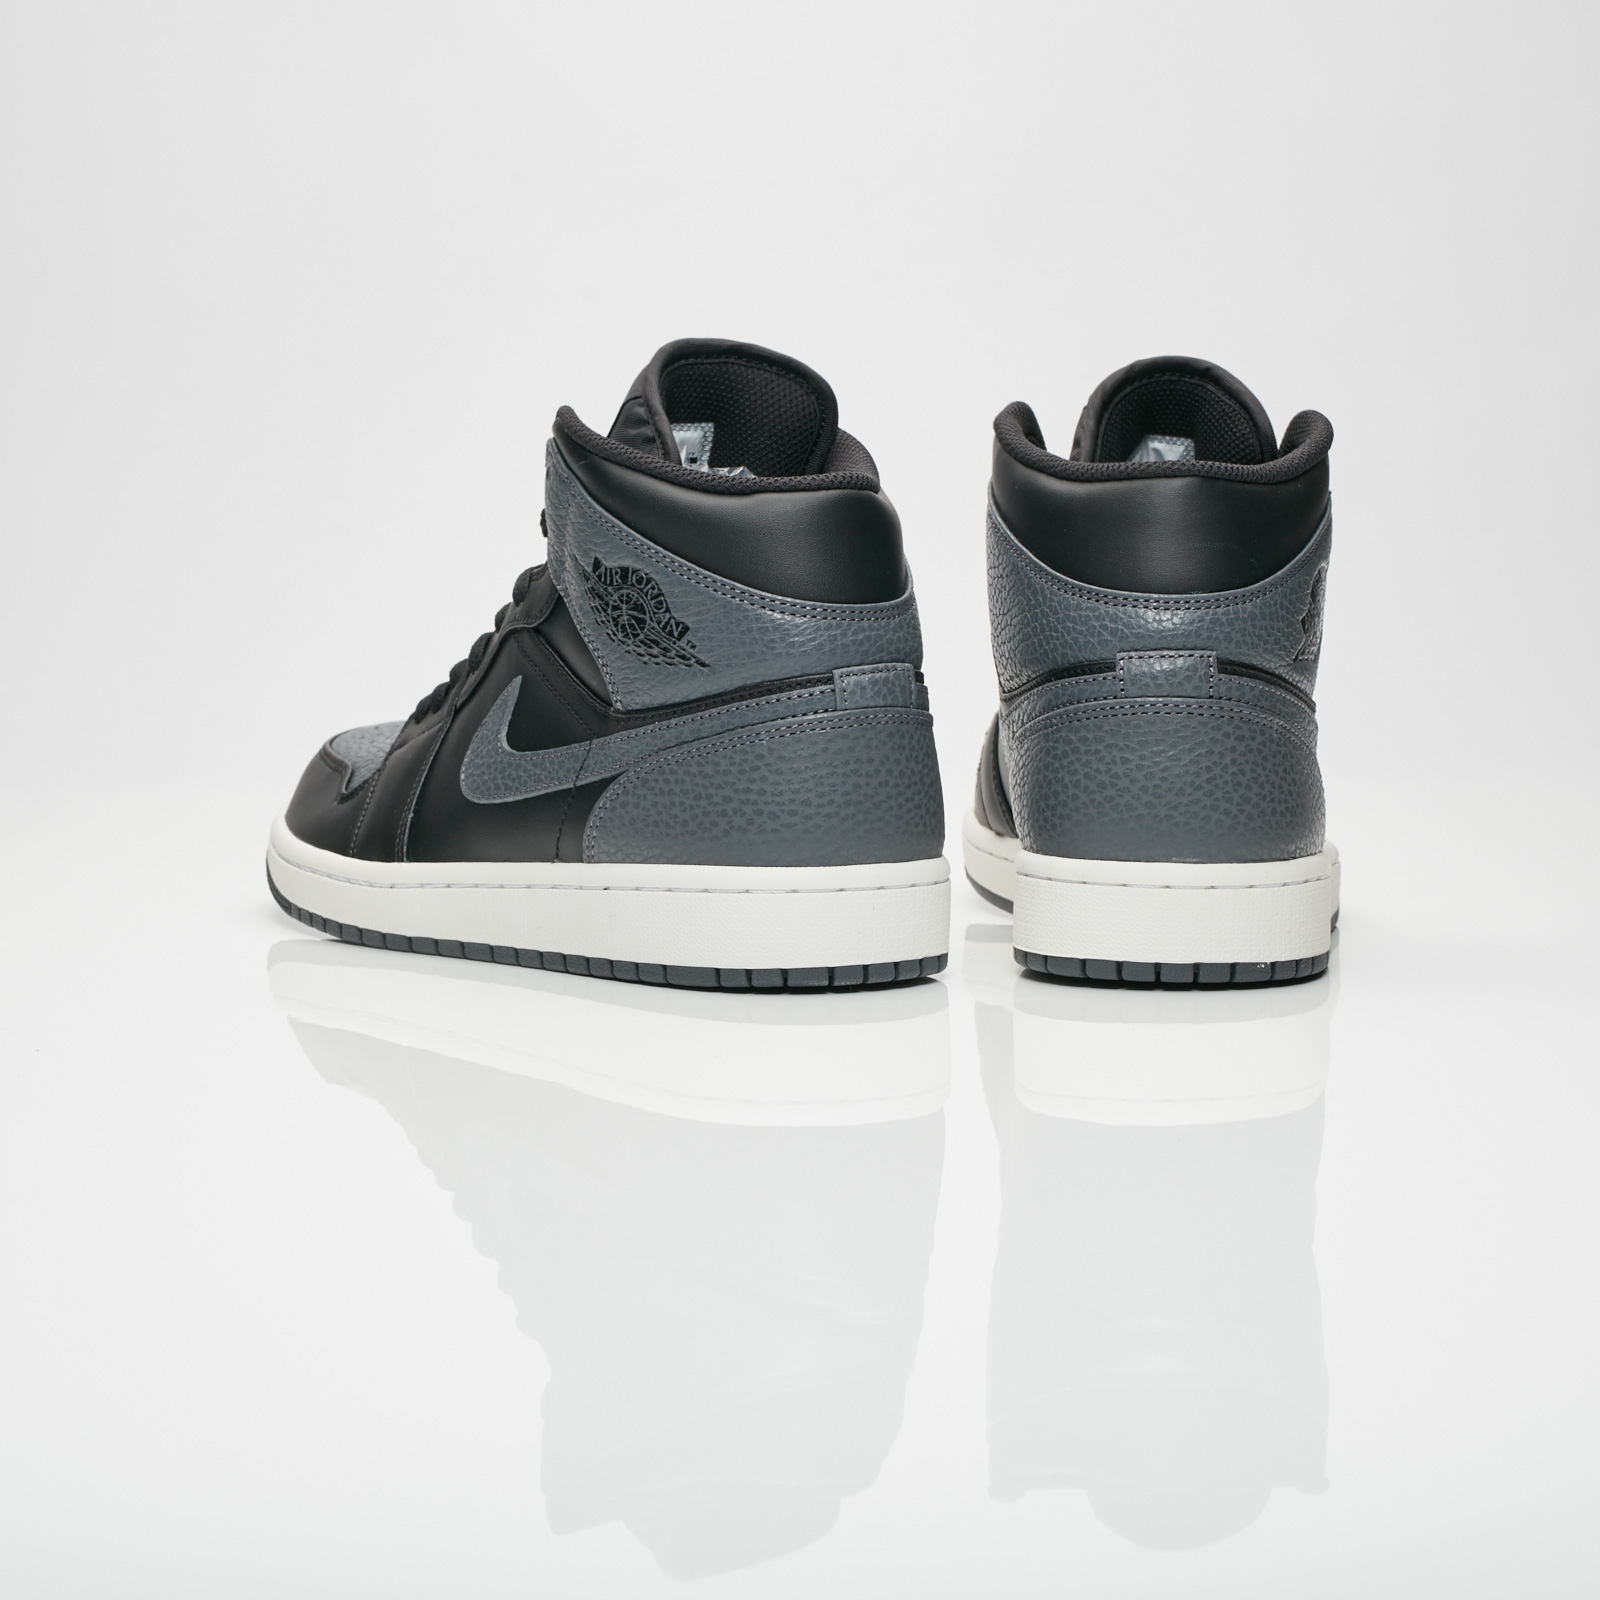 brand new 70d92 1729e Jordan Brand Air Jordan 1 Mid - 554724-041 - Sneakersnstuff   sneakers    streetwear online since 1999